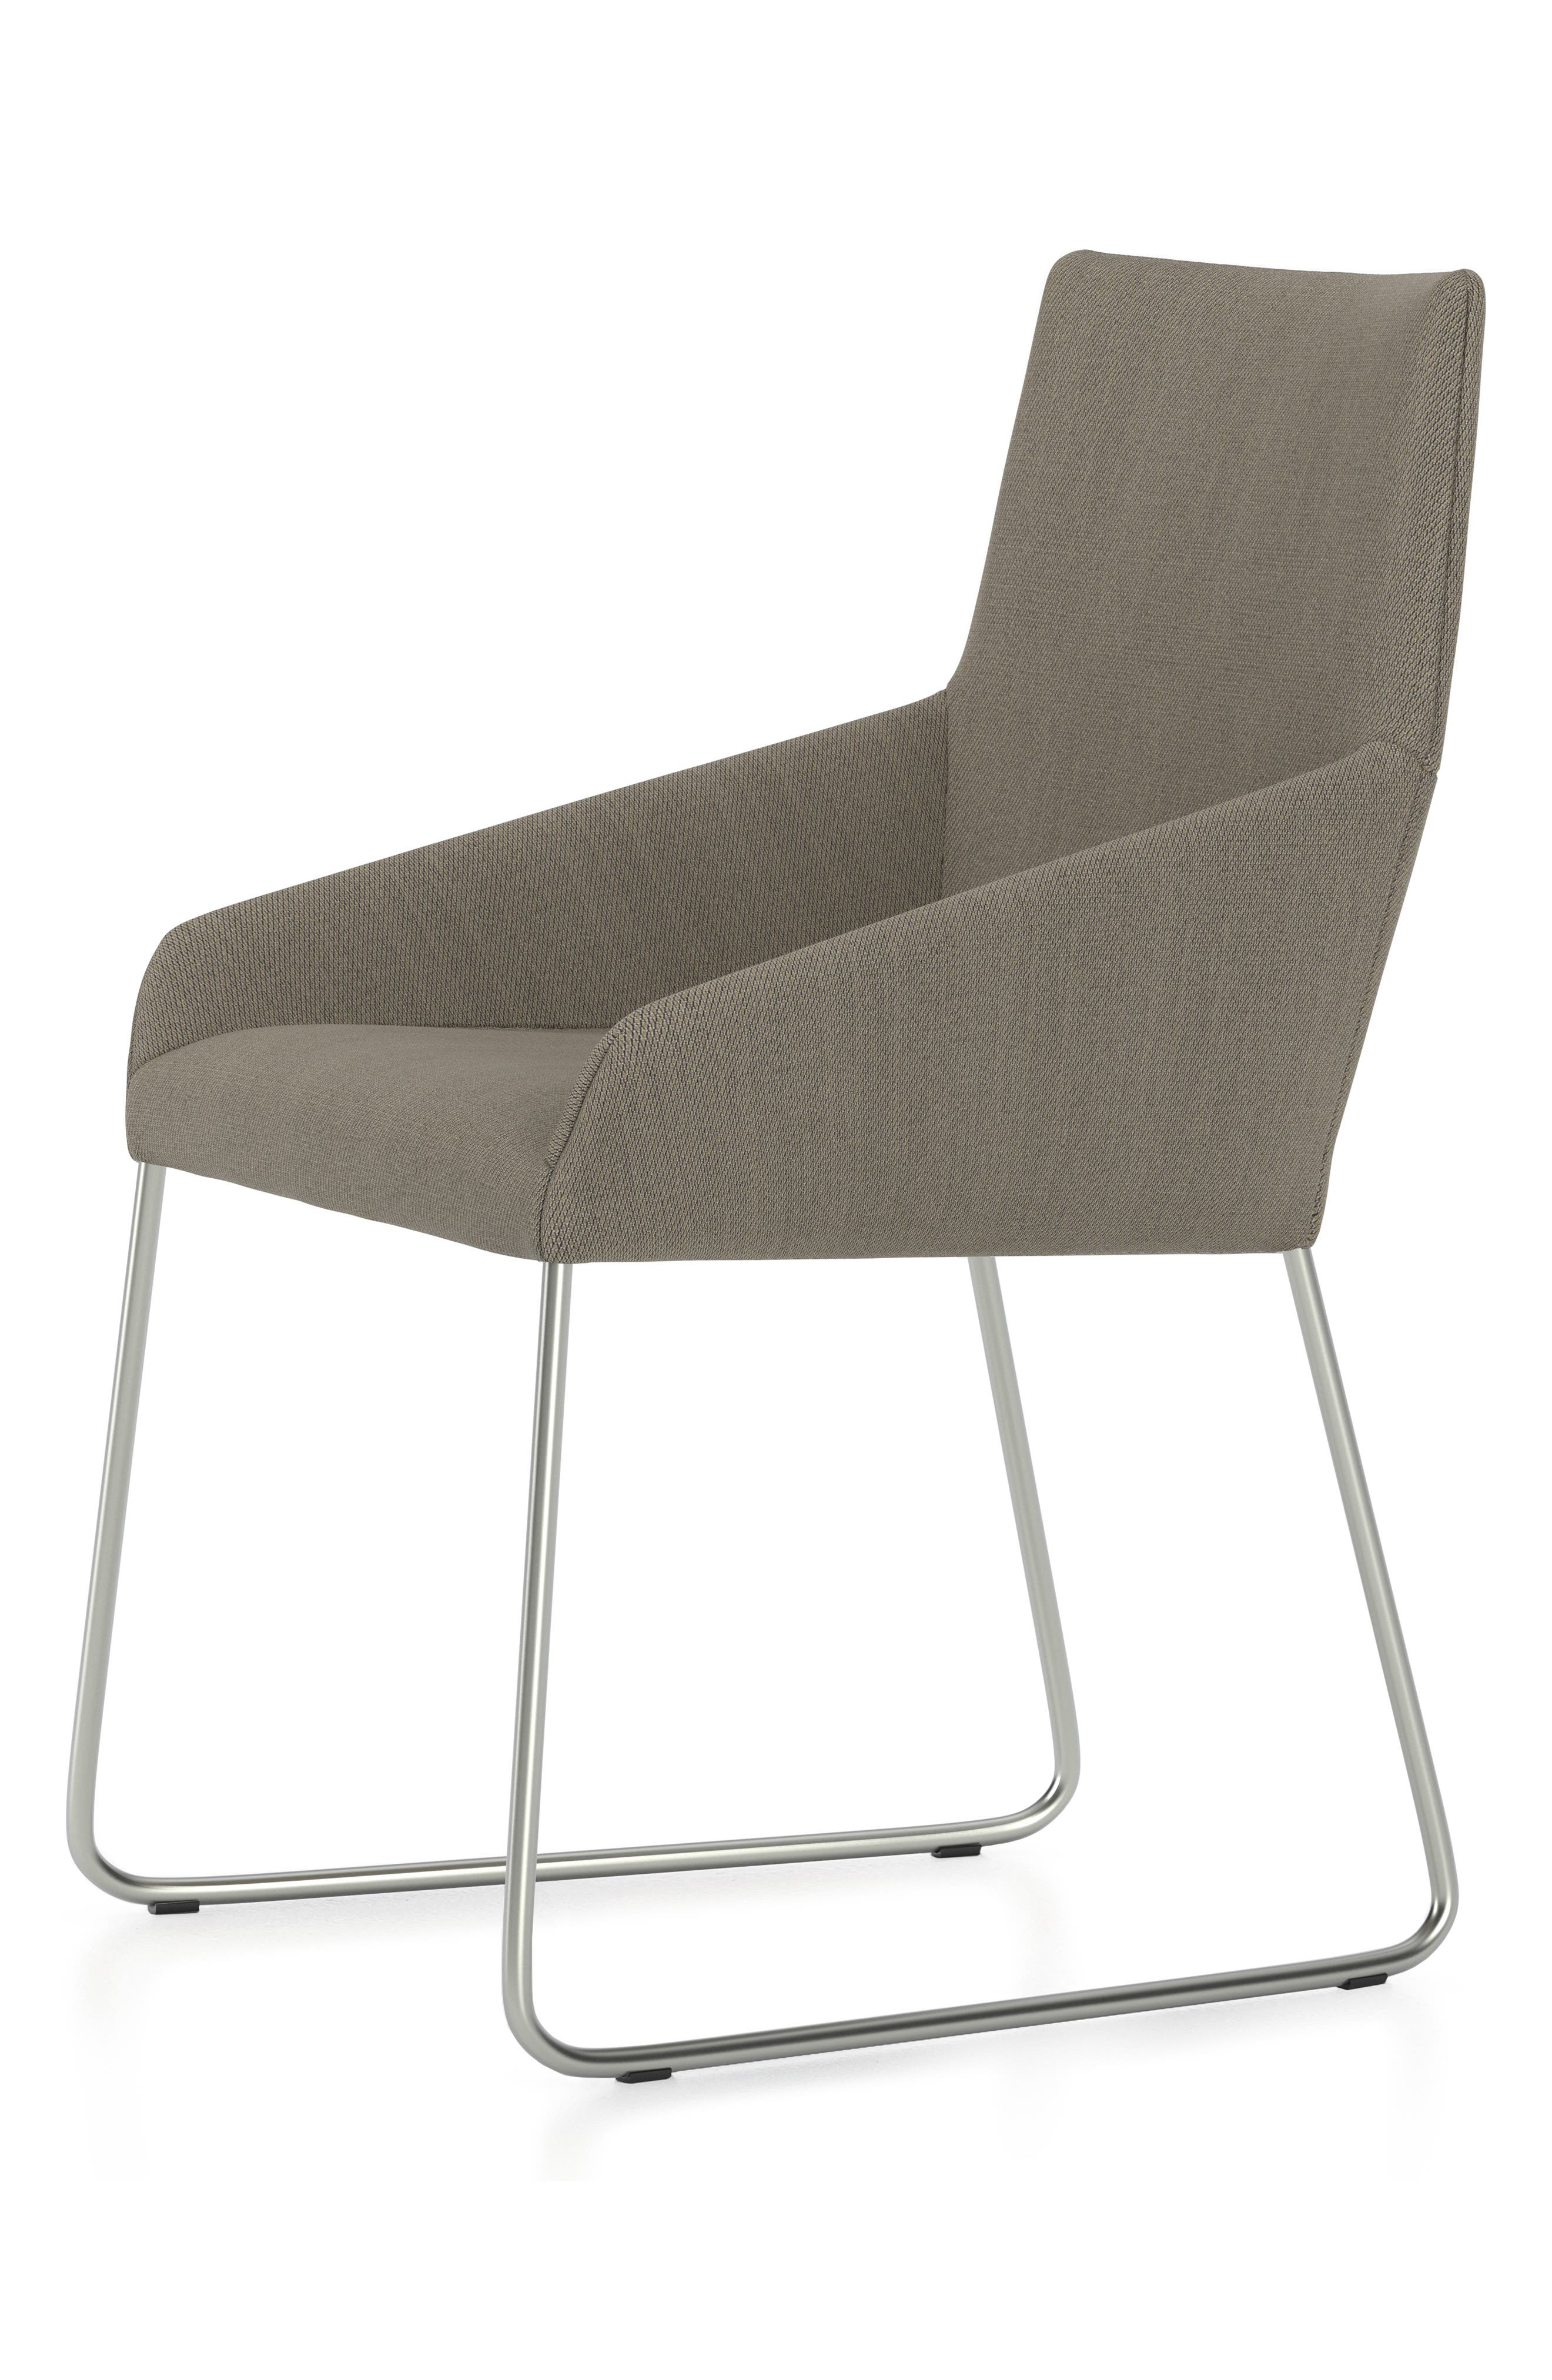 Amazing Chairs Home Decor Nordstrom Creativecarmelina Interior Chair Design Creativecarmelinacom